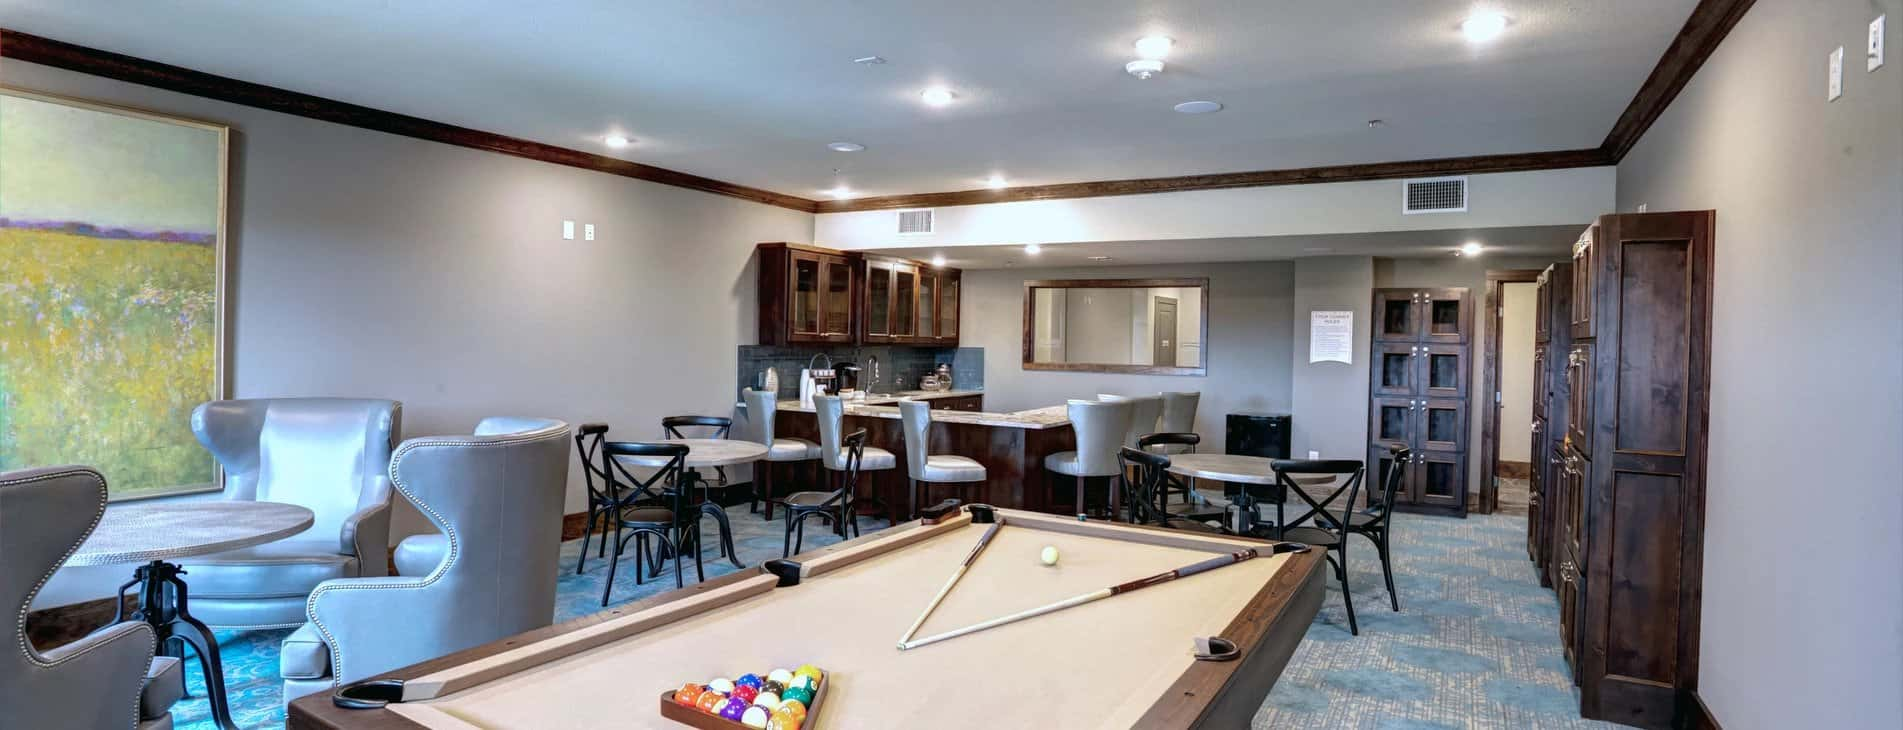 Billiard room design by Larkspur At Twin Creeks